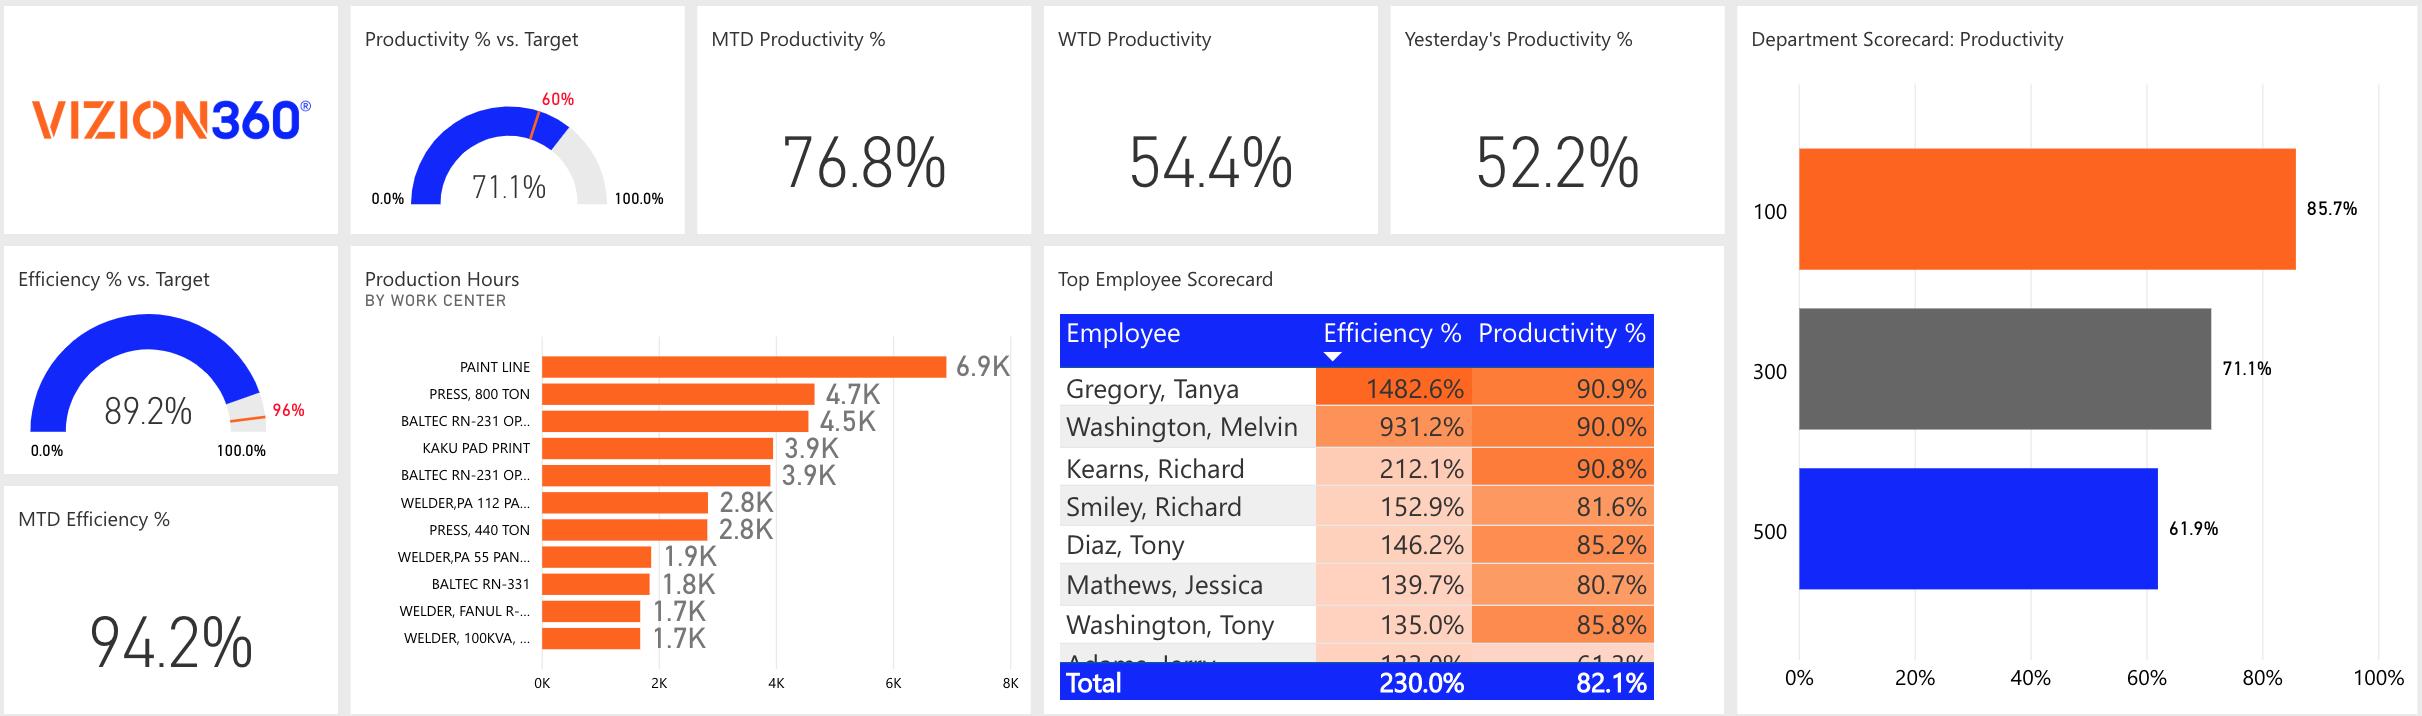 Executive Scorecard | Vizion360 Custom Dashboard with Impact Analytics featuring Power BI